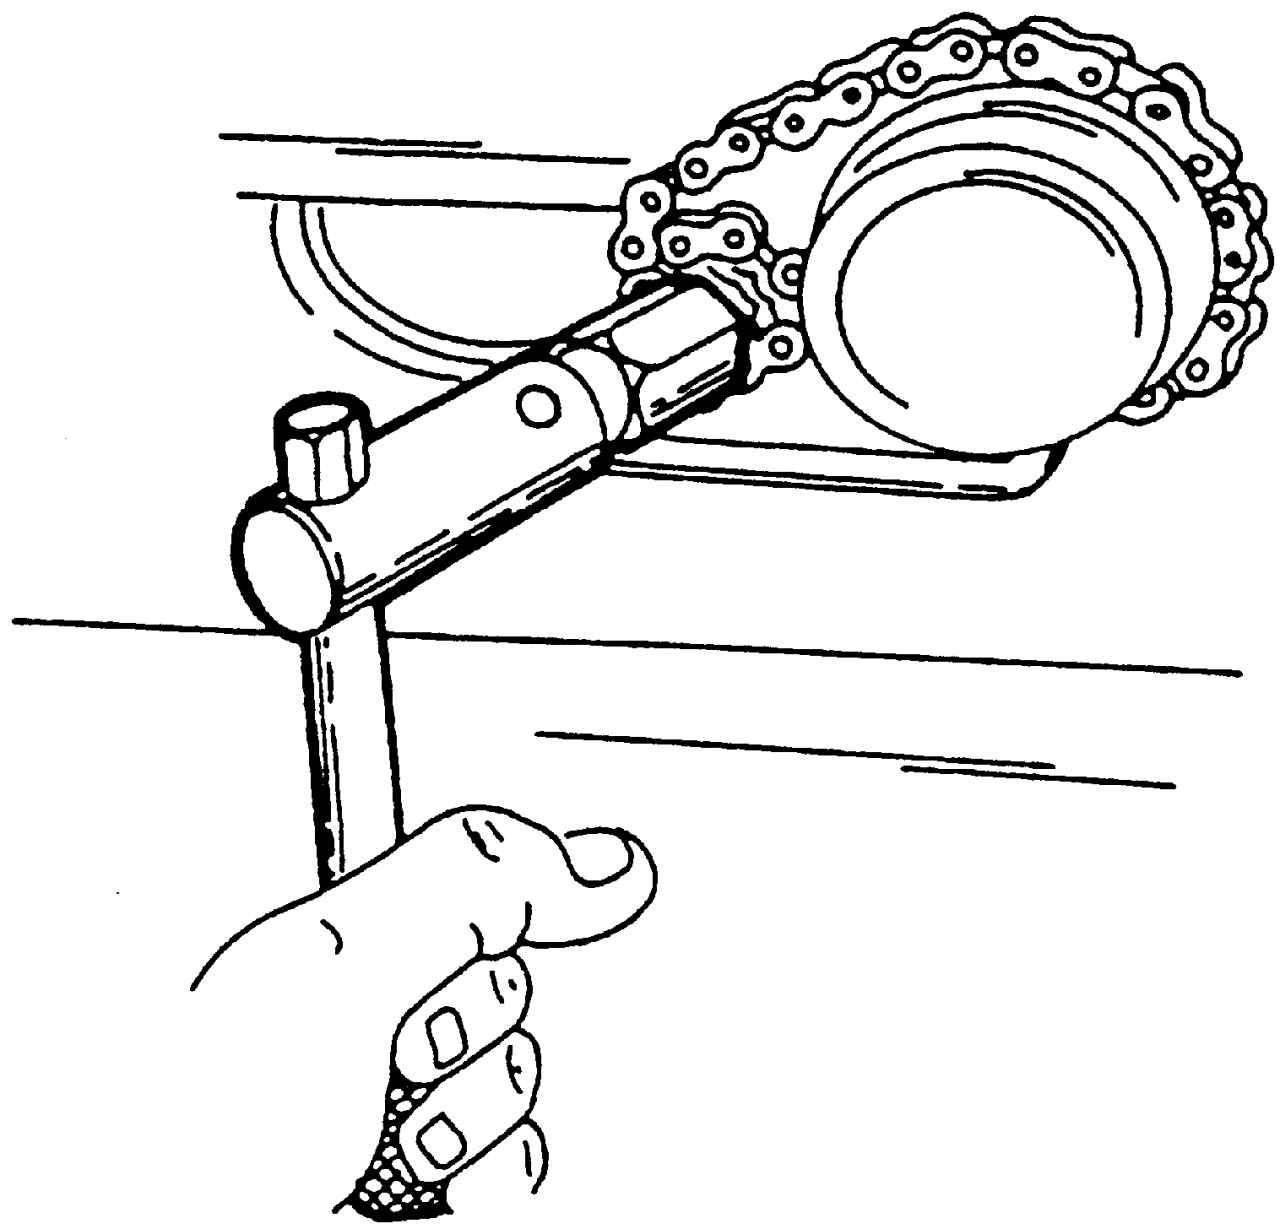 Ключ для снятия фильтра своими руками